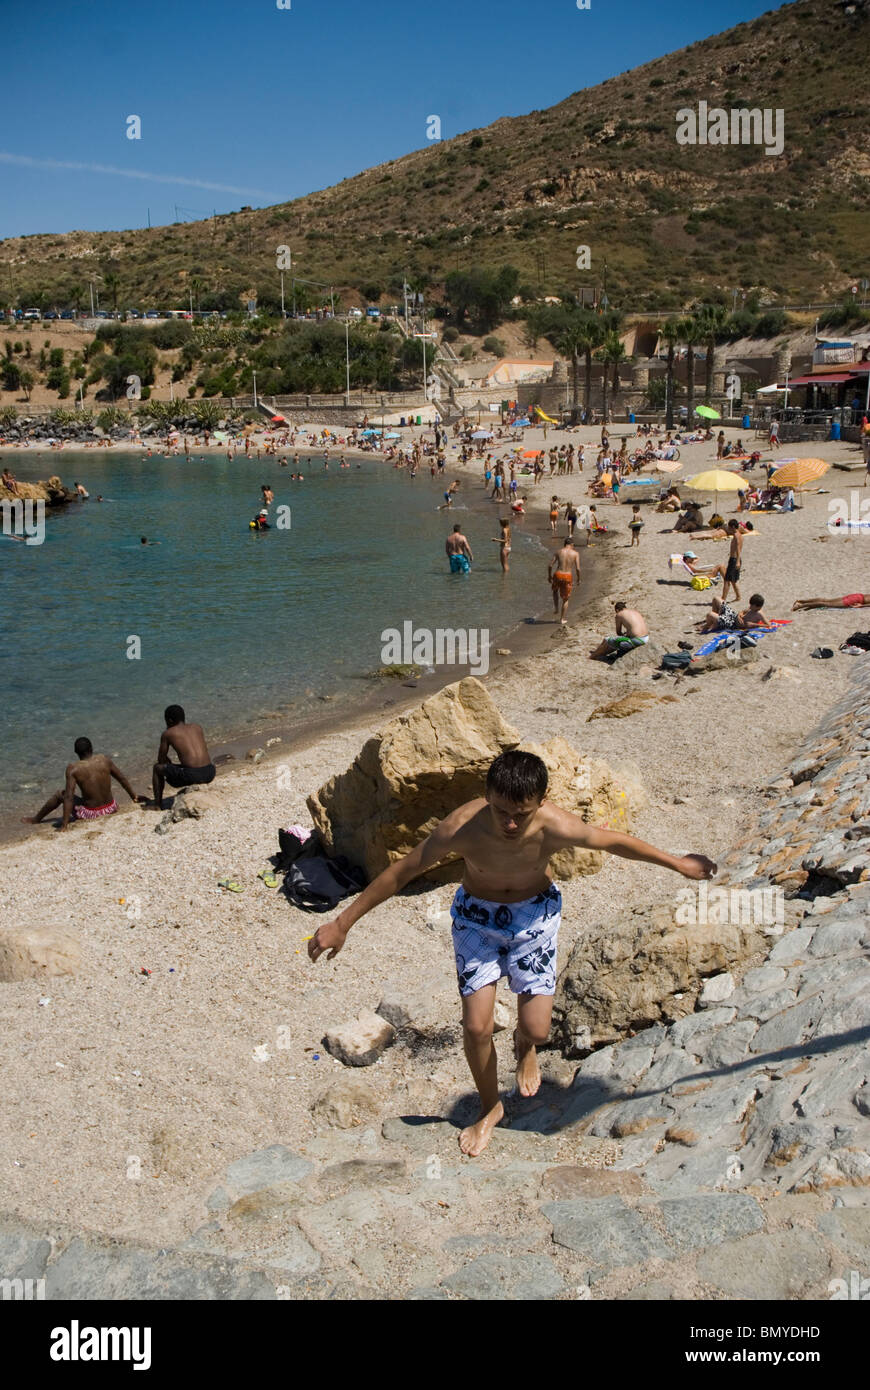 Playa Cala Cortina CARTAGENA CIUDAD region Murcia ESPAÑA Cala Cortina beach CARTAGENA CITY Murcia region SPAIN - Stock Image